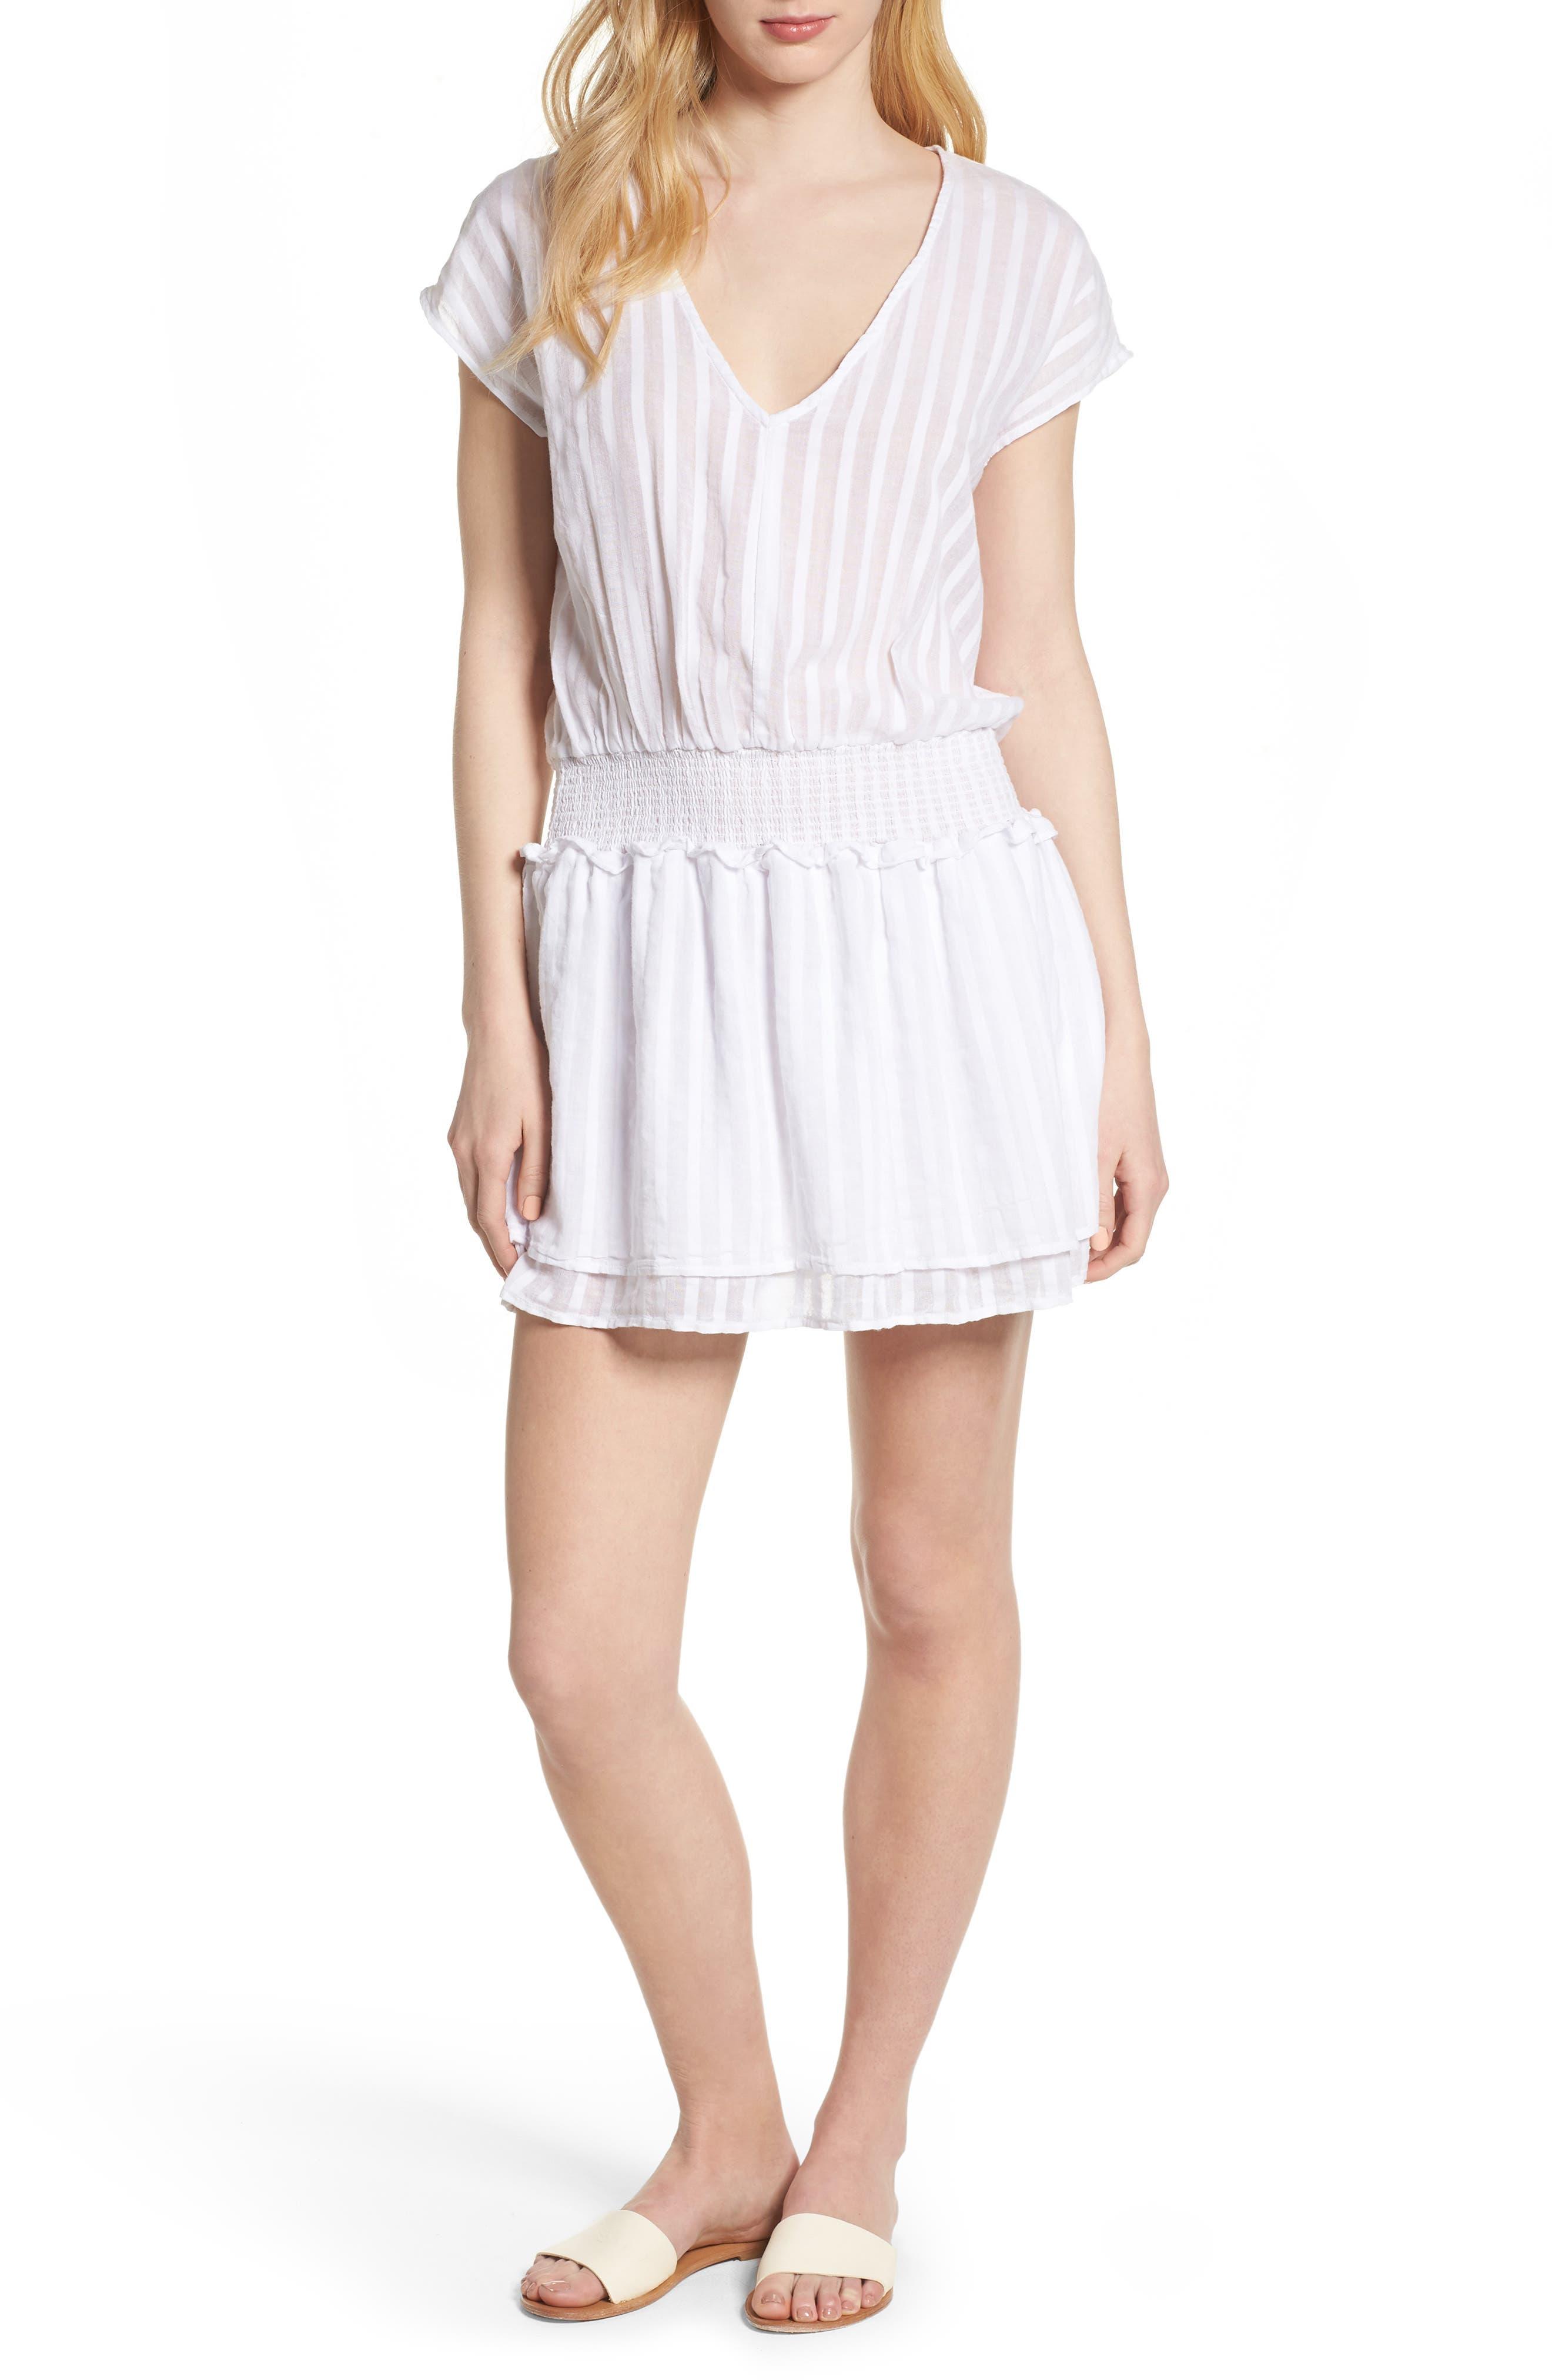 Lucca Blouson Cotton Dress,                             Main thumbnail 1, color,                             WHITE SHADOW STRIPE